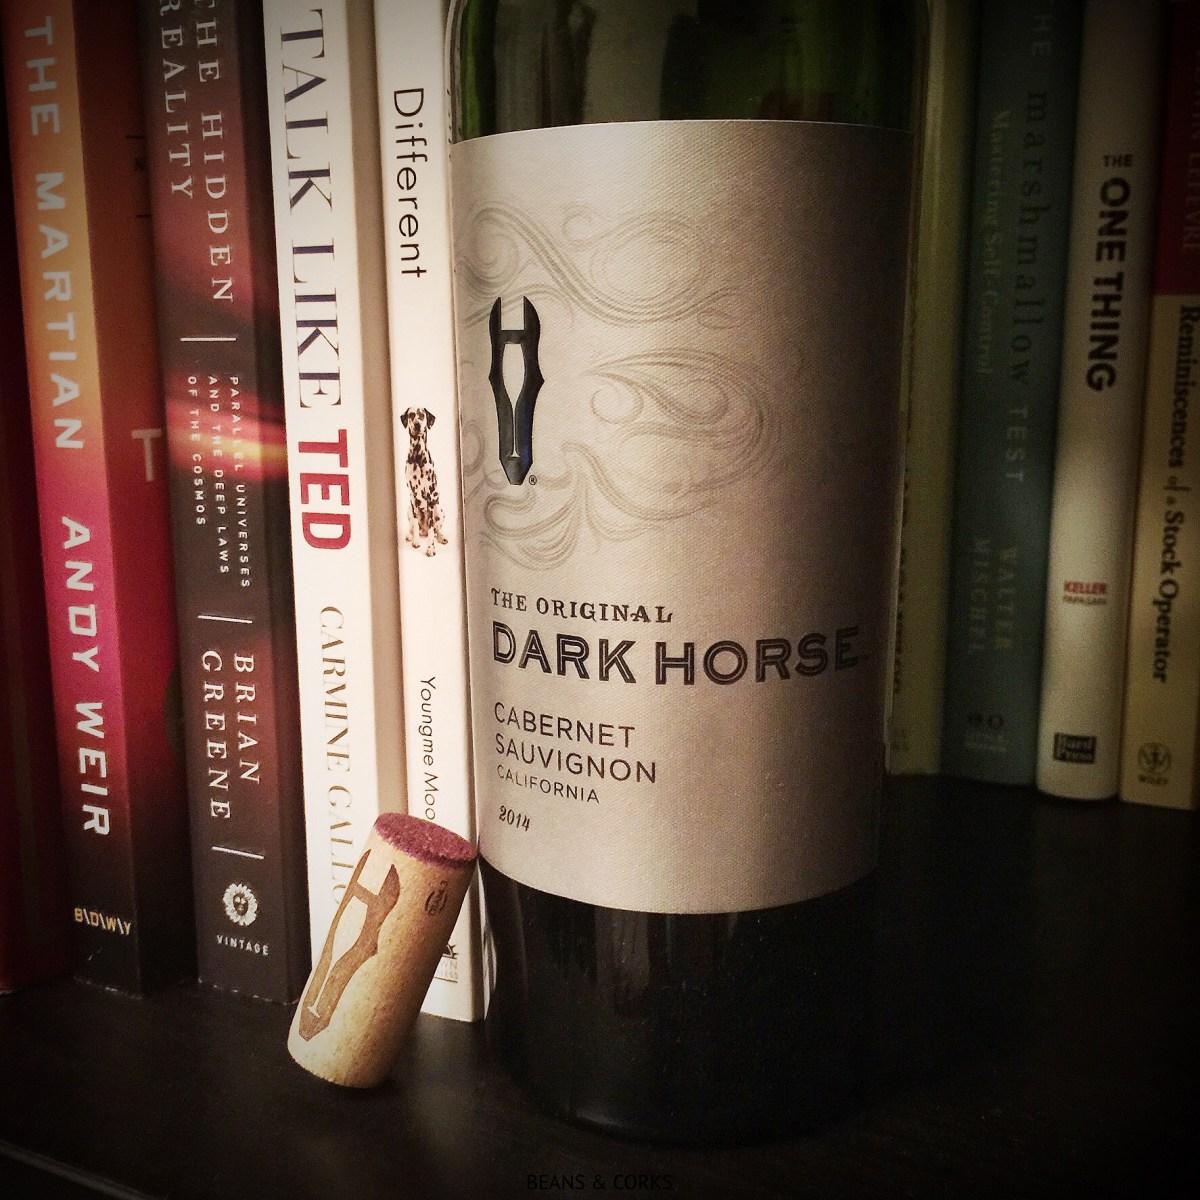 2014 Dark Horse Wines The Original Dark Horse Cabernet